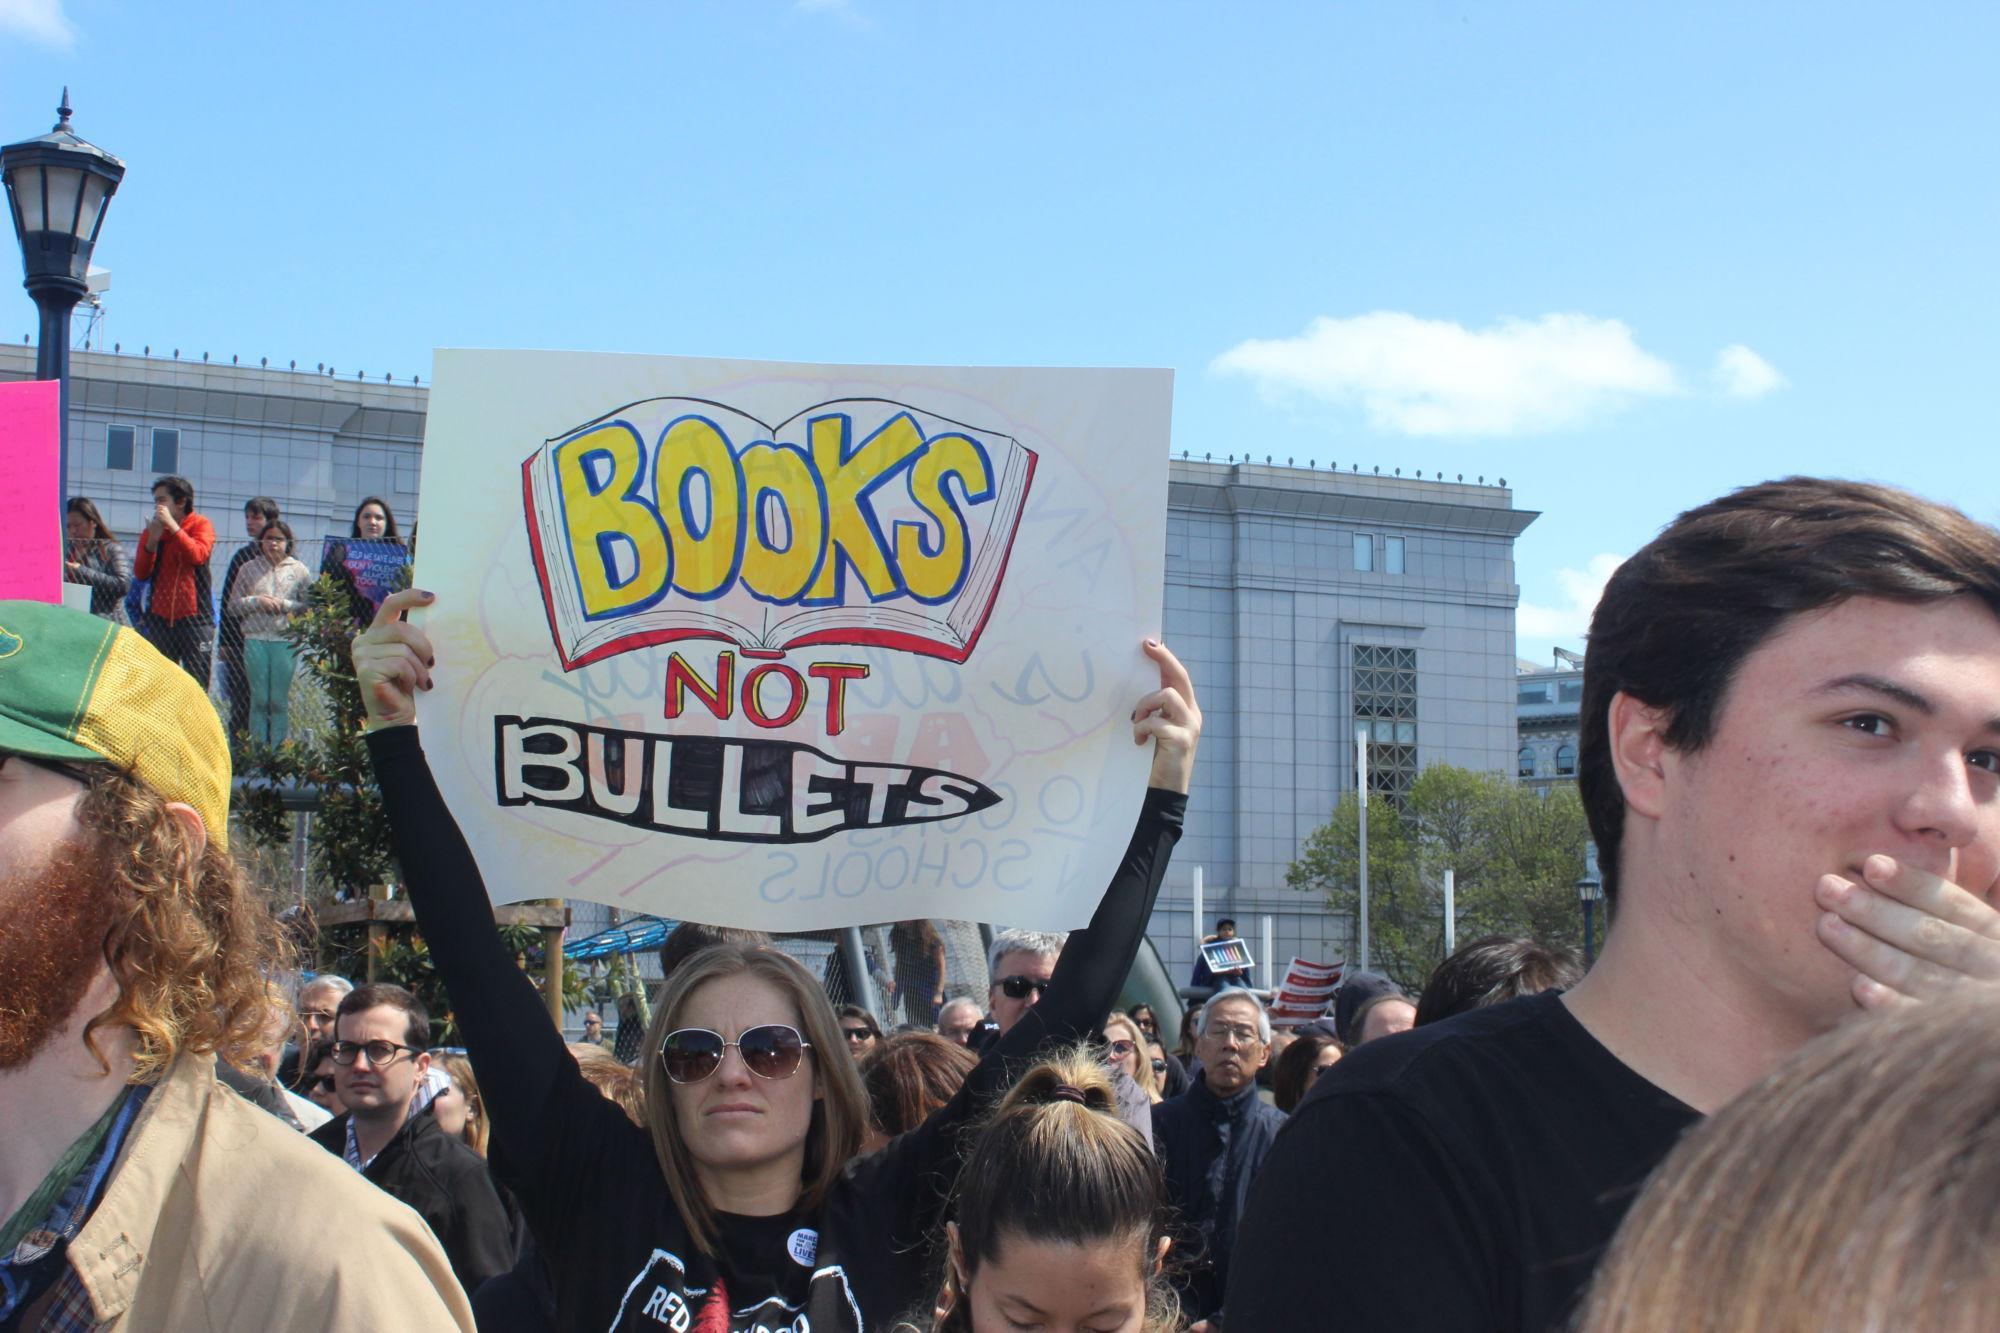 Teacher+Amy+Mastromonaco+holds+a+poster+that+reads+%E2%80%9CBooks+not+bullets%E2%80%9D